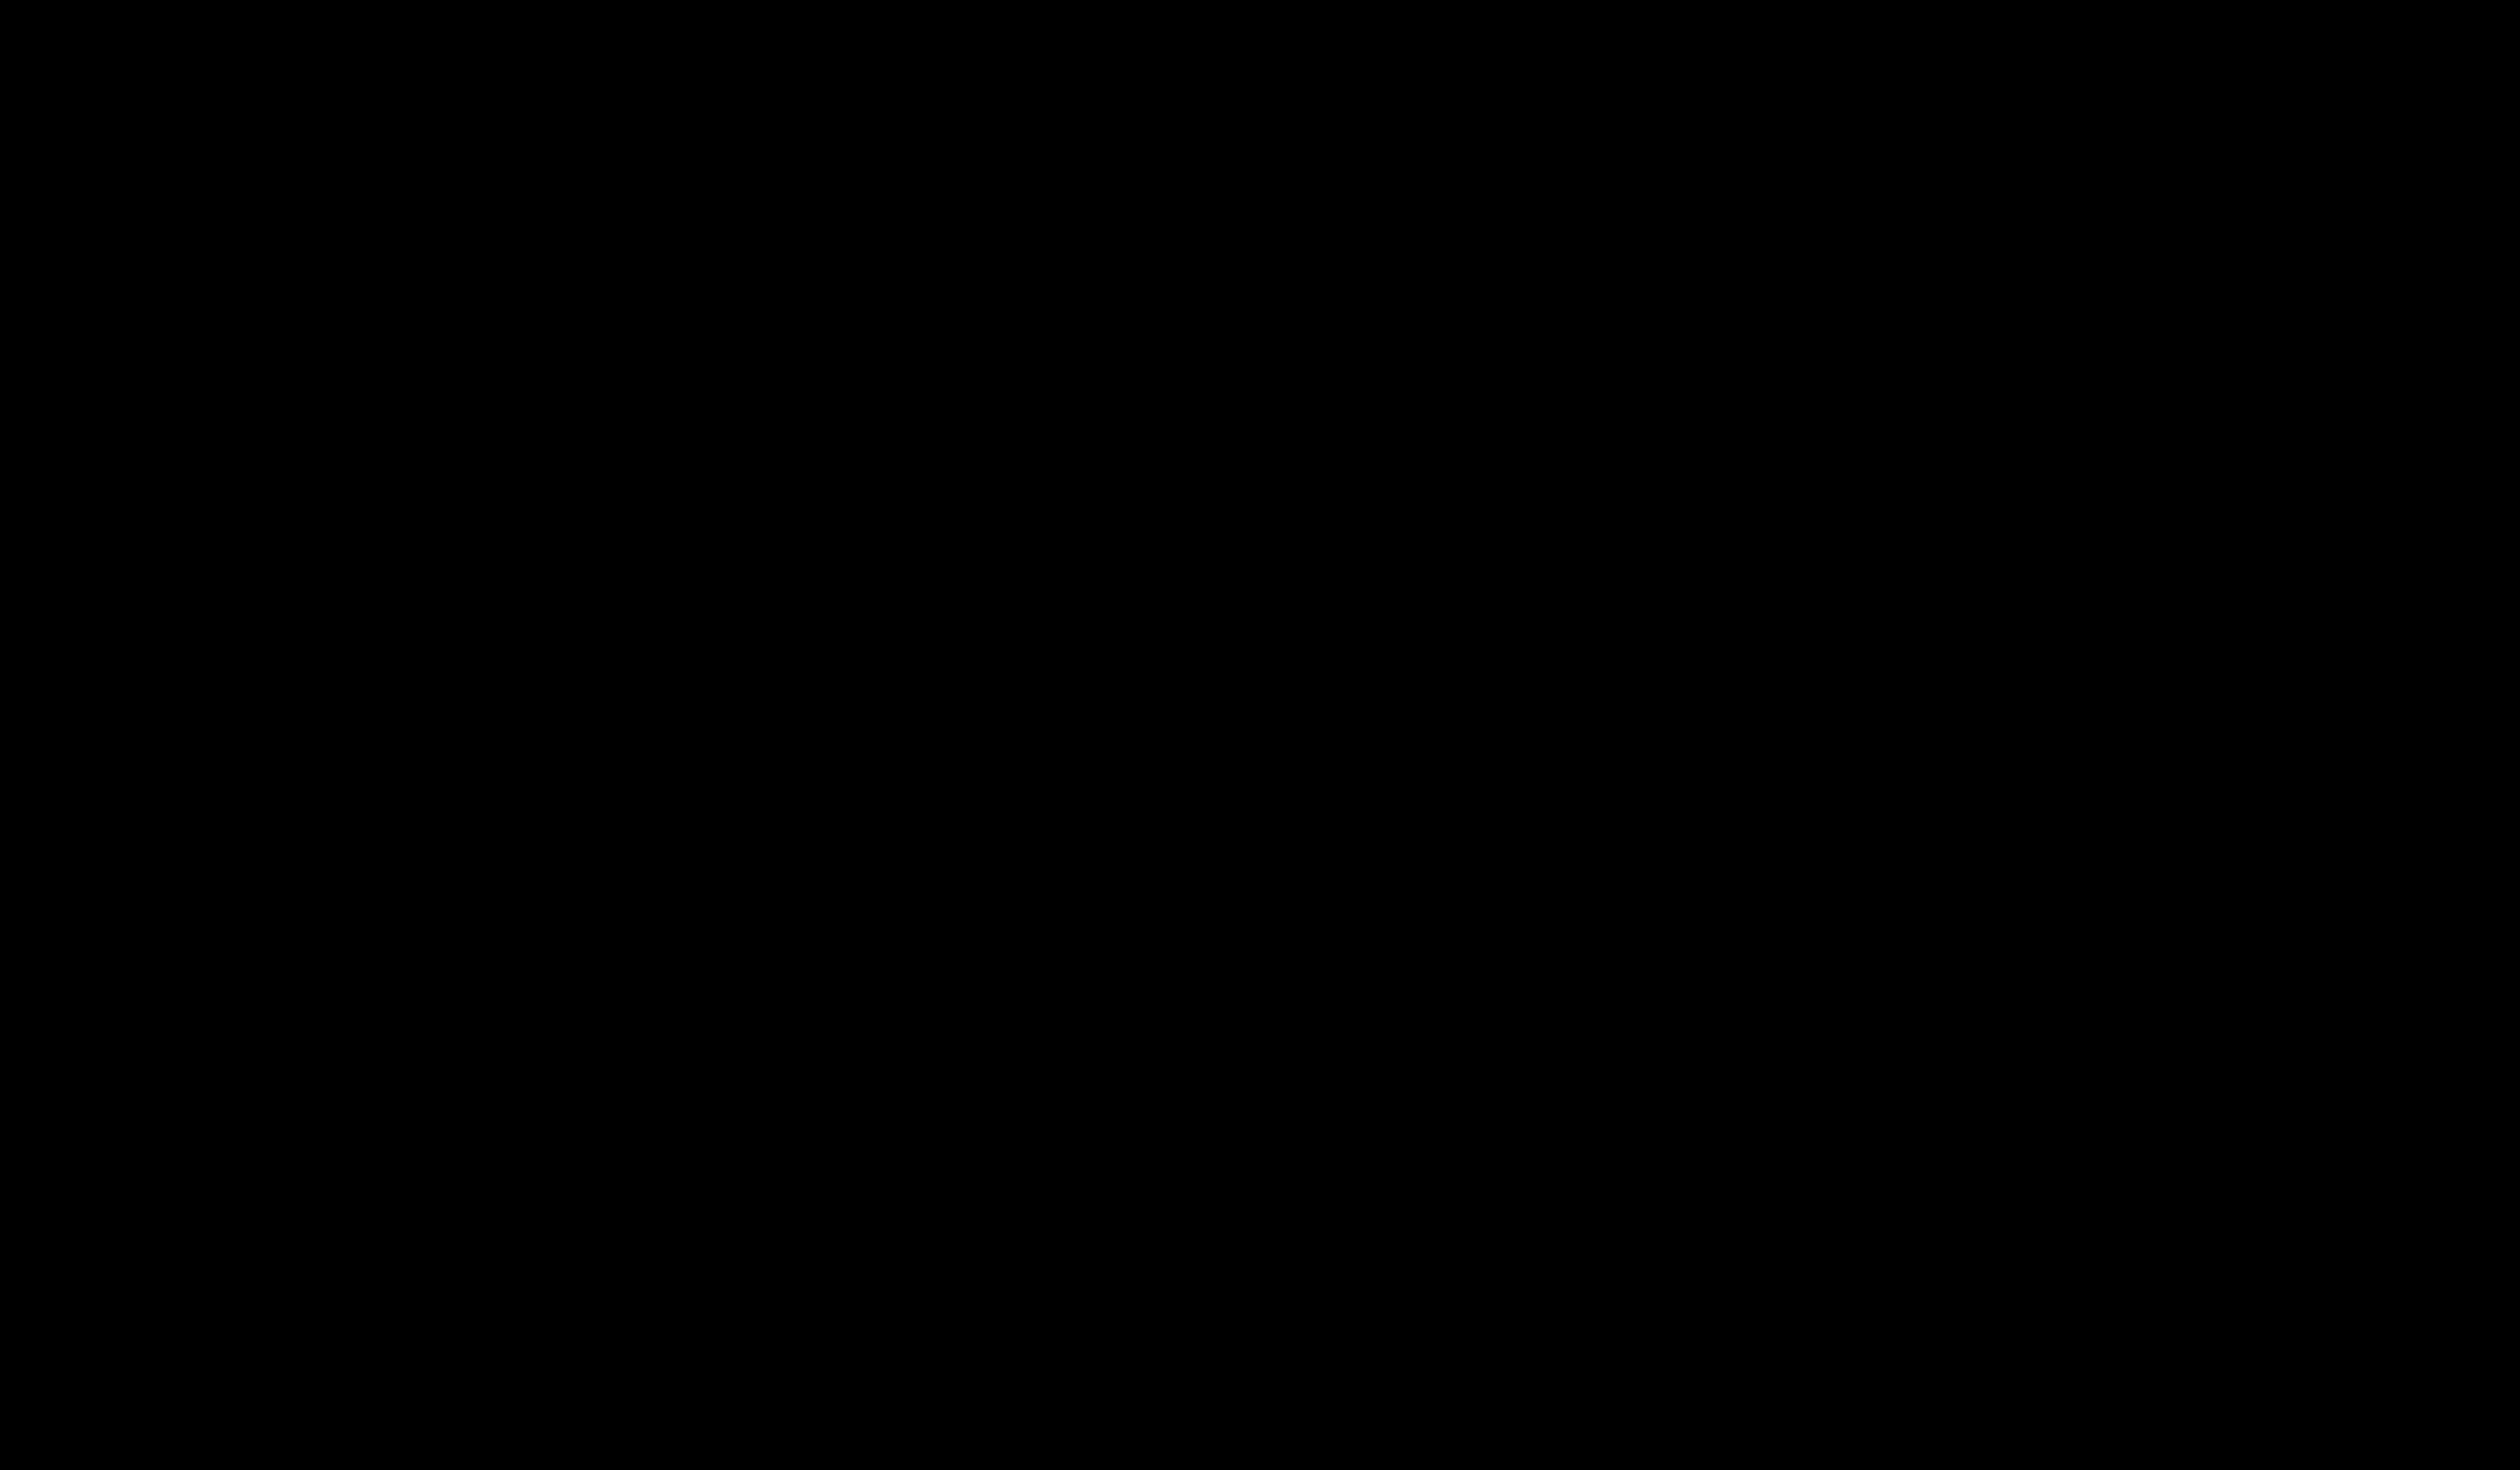 black background   Large Images 6250x3646